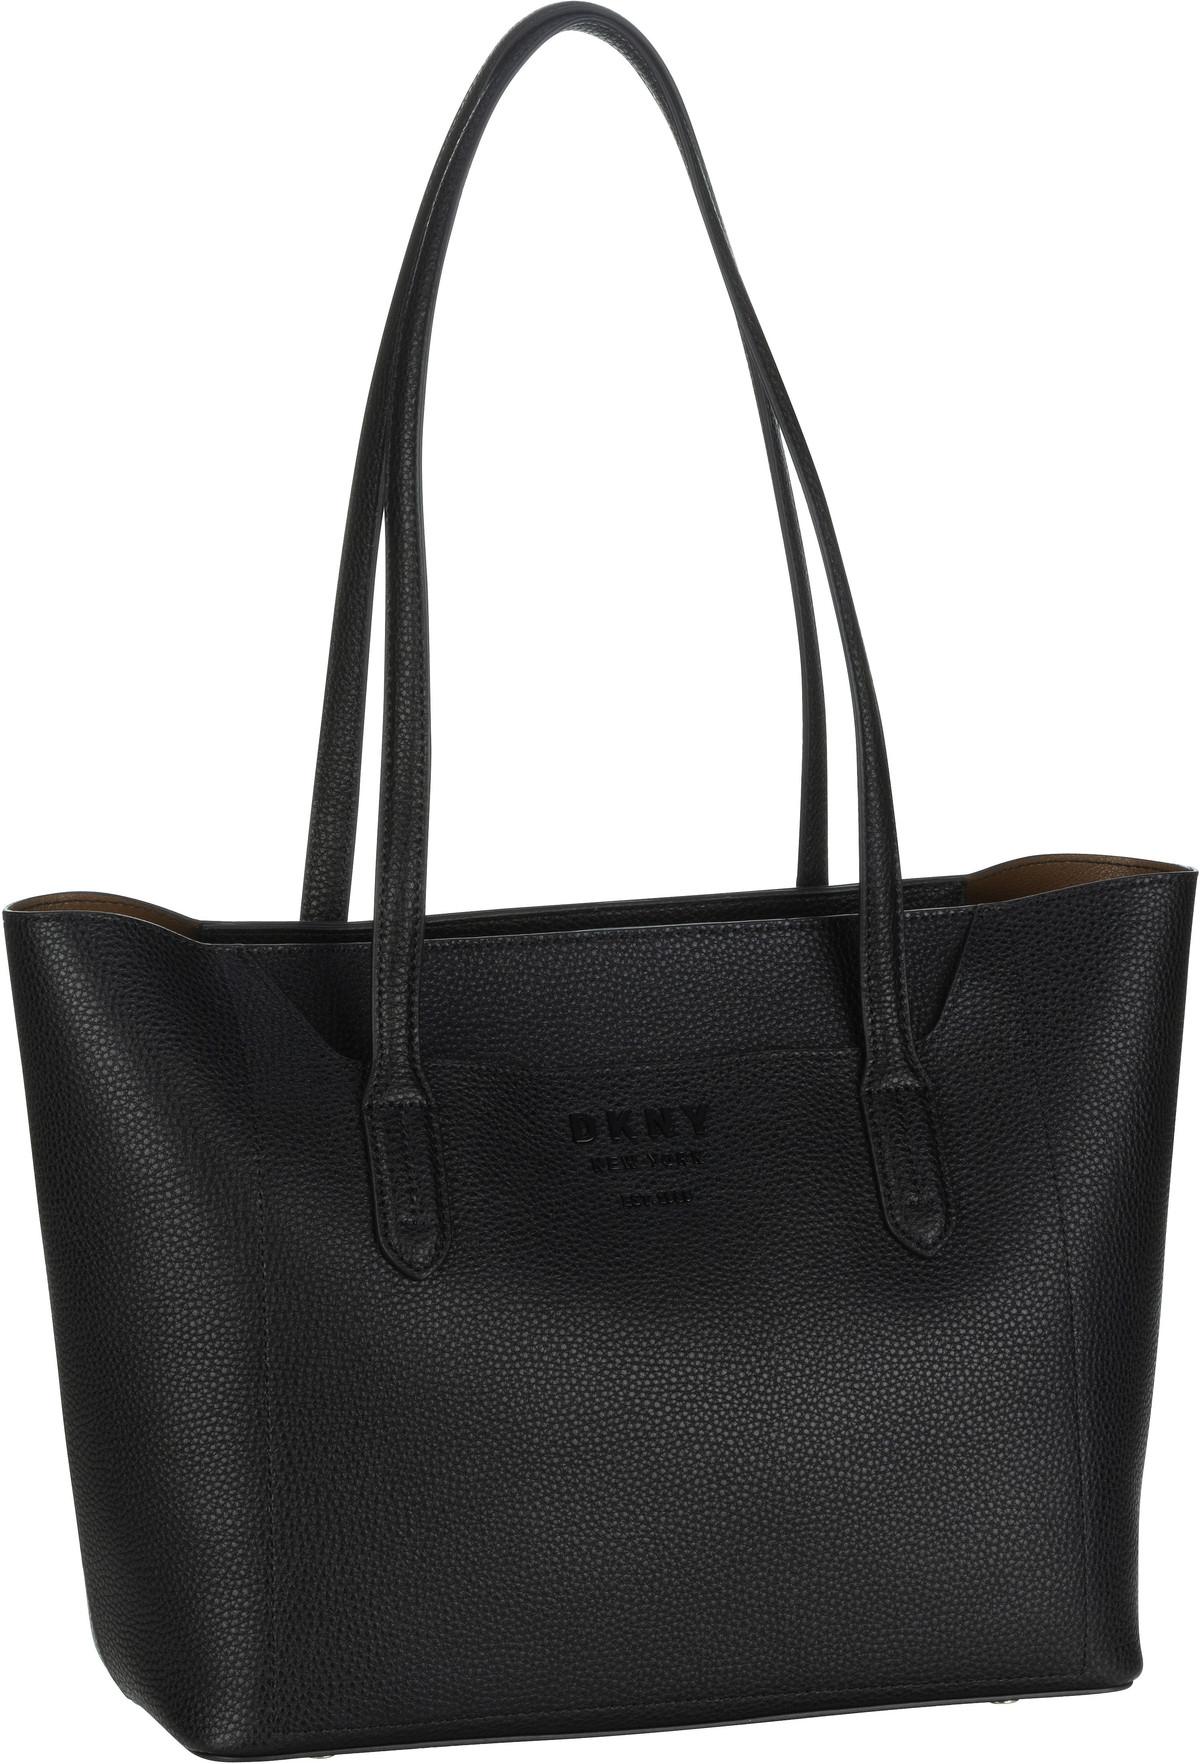 Handtasche Noho Pebble EW Tote Black/Vicuna (innen: Braun)